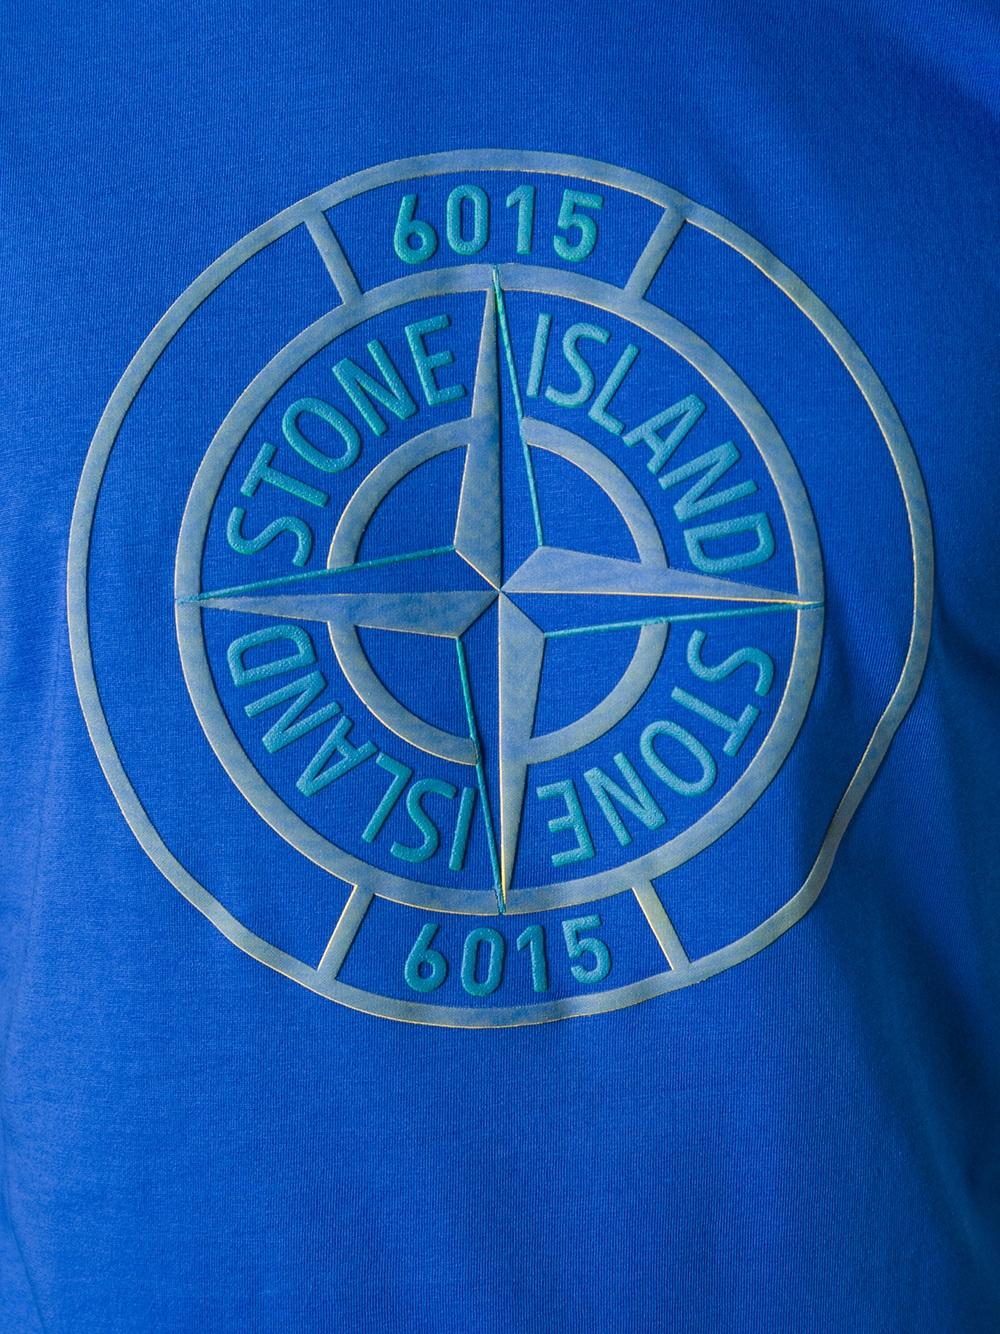 lyst stone island logo print t shirt in blue for men. Black Bedroom Furniture Sets. Home Design Ideas